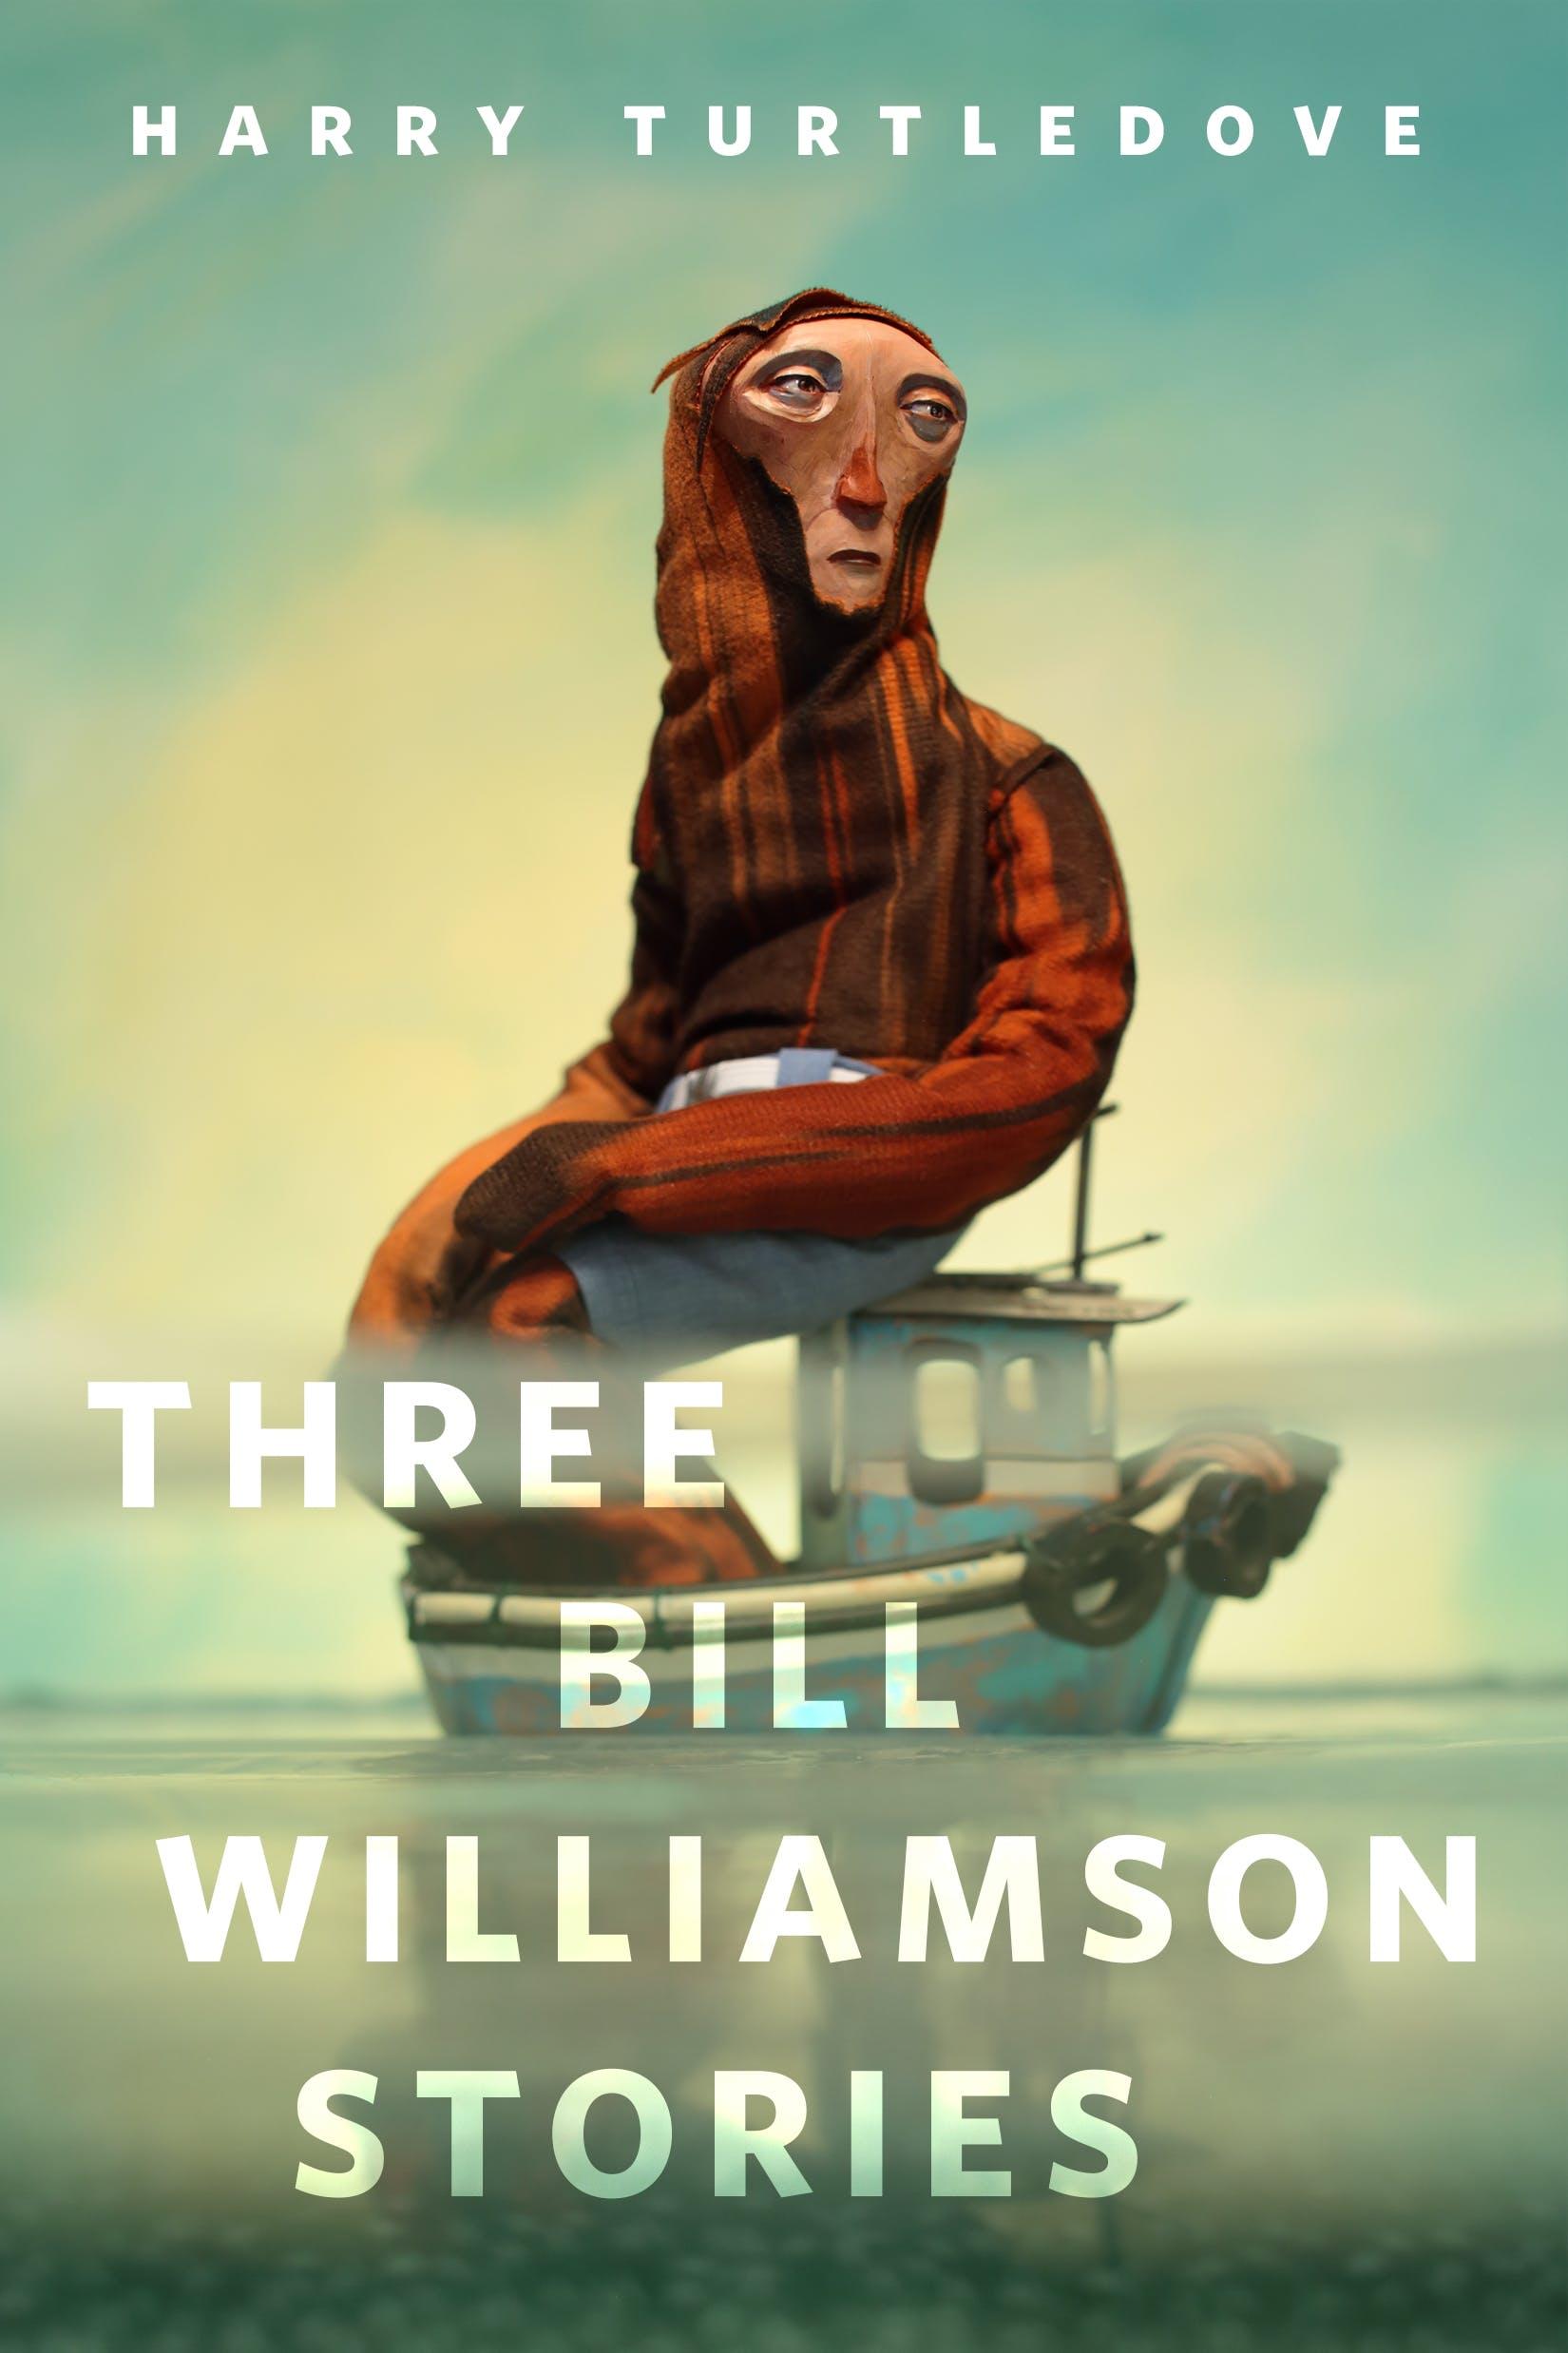 Image of Three Bill Williamson Stories